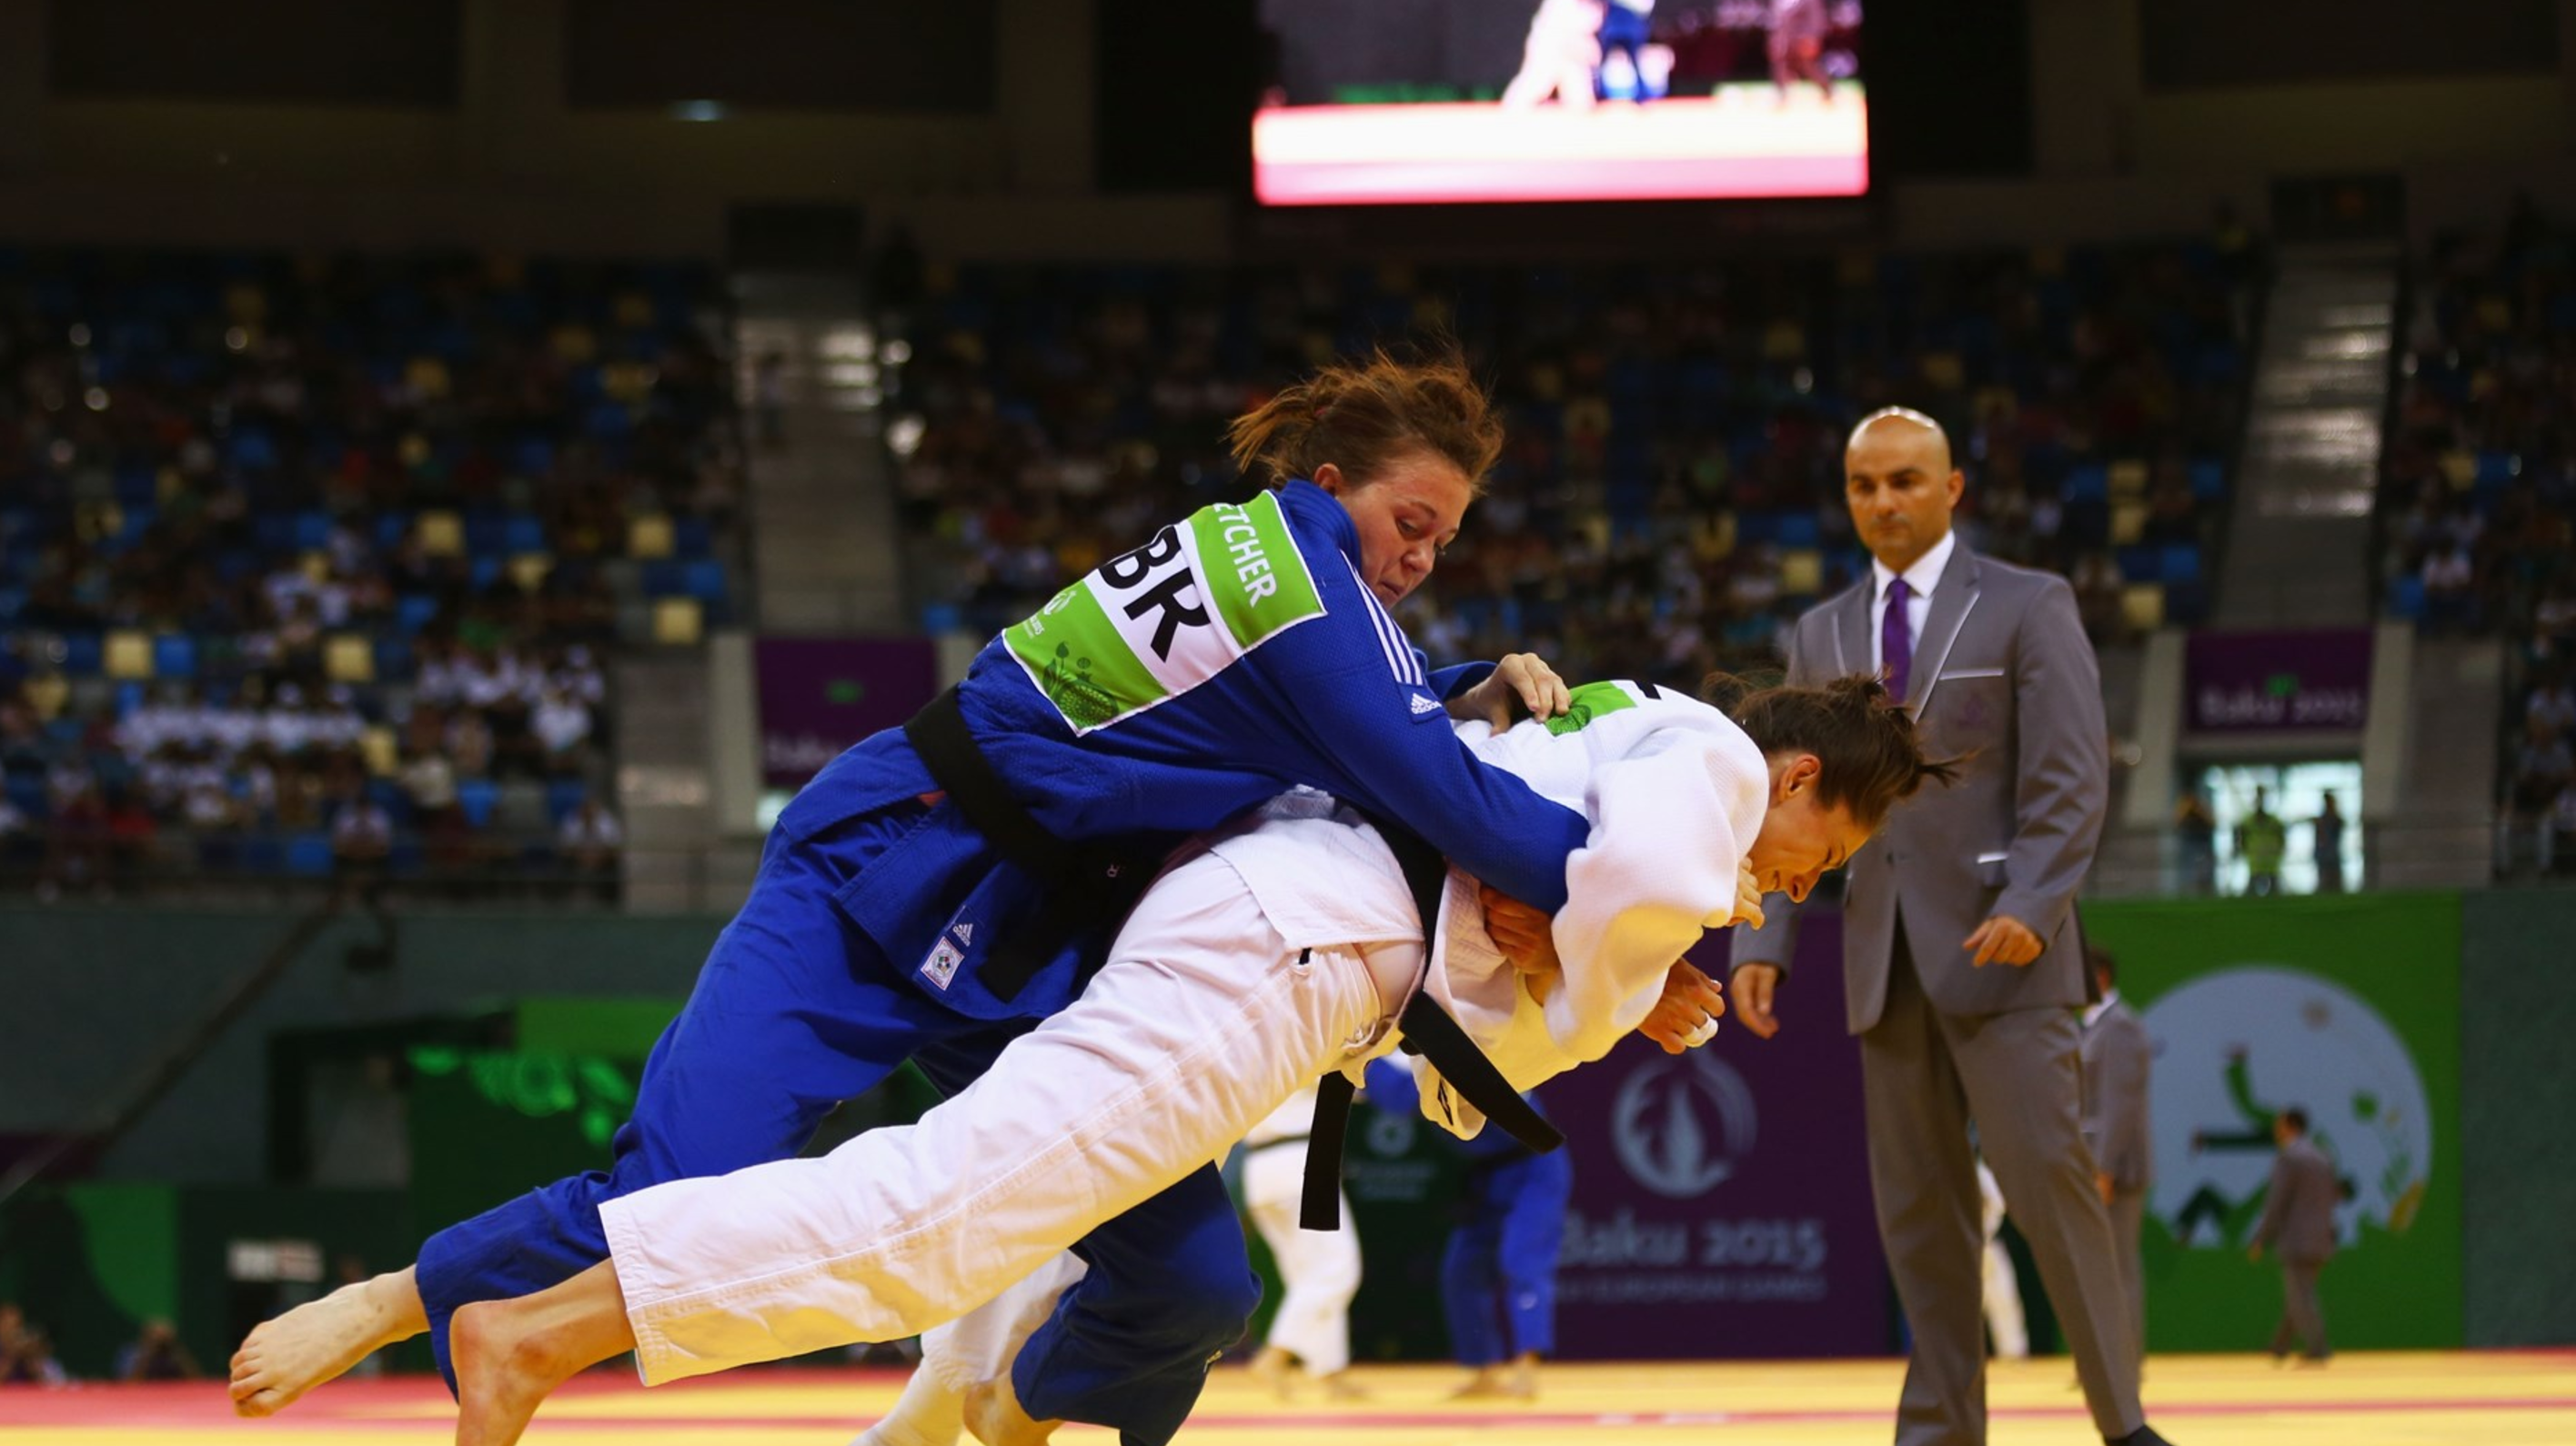 Judo champ Megan Fletcher tells us how her diet meets her training needs...